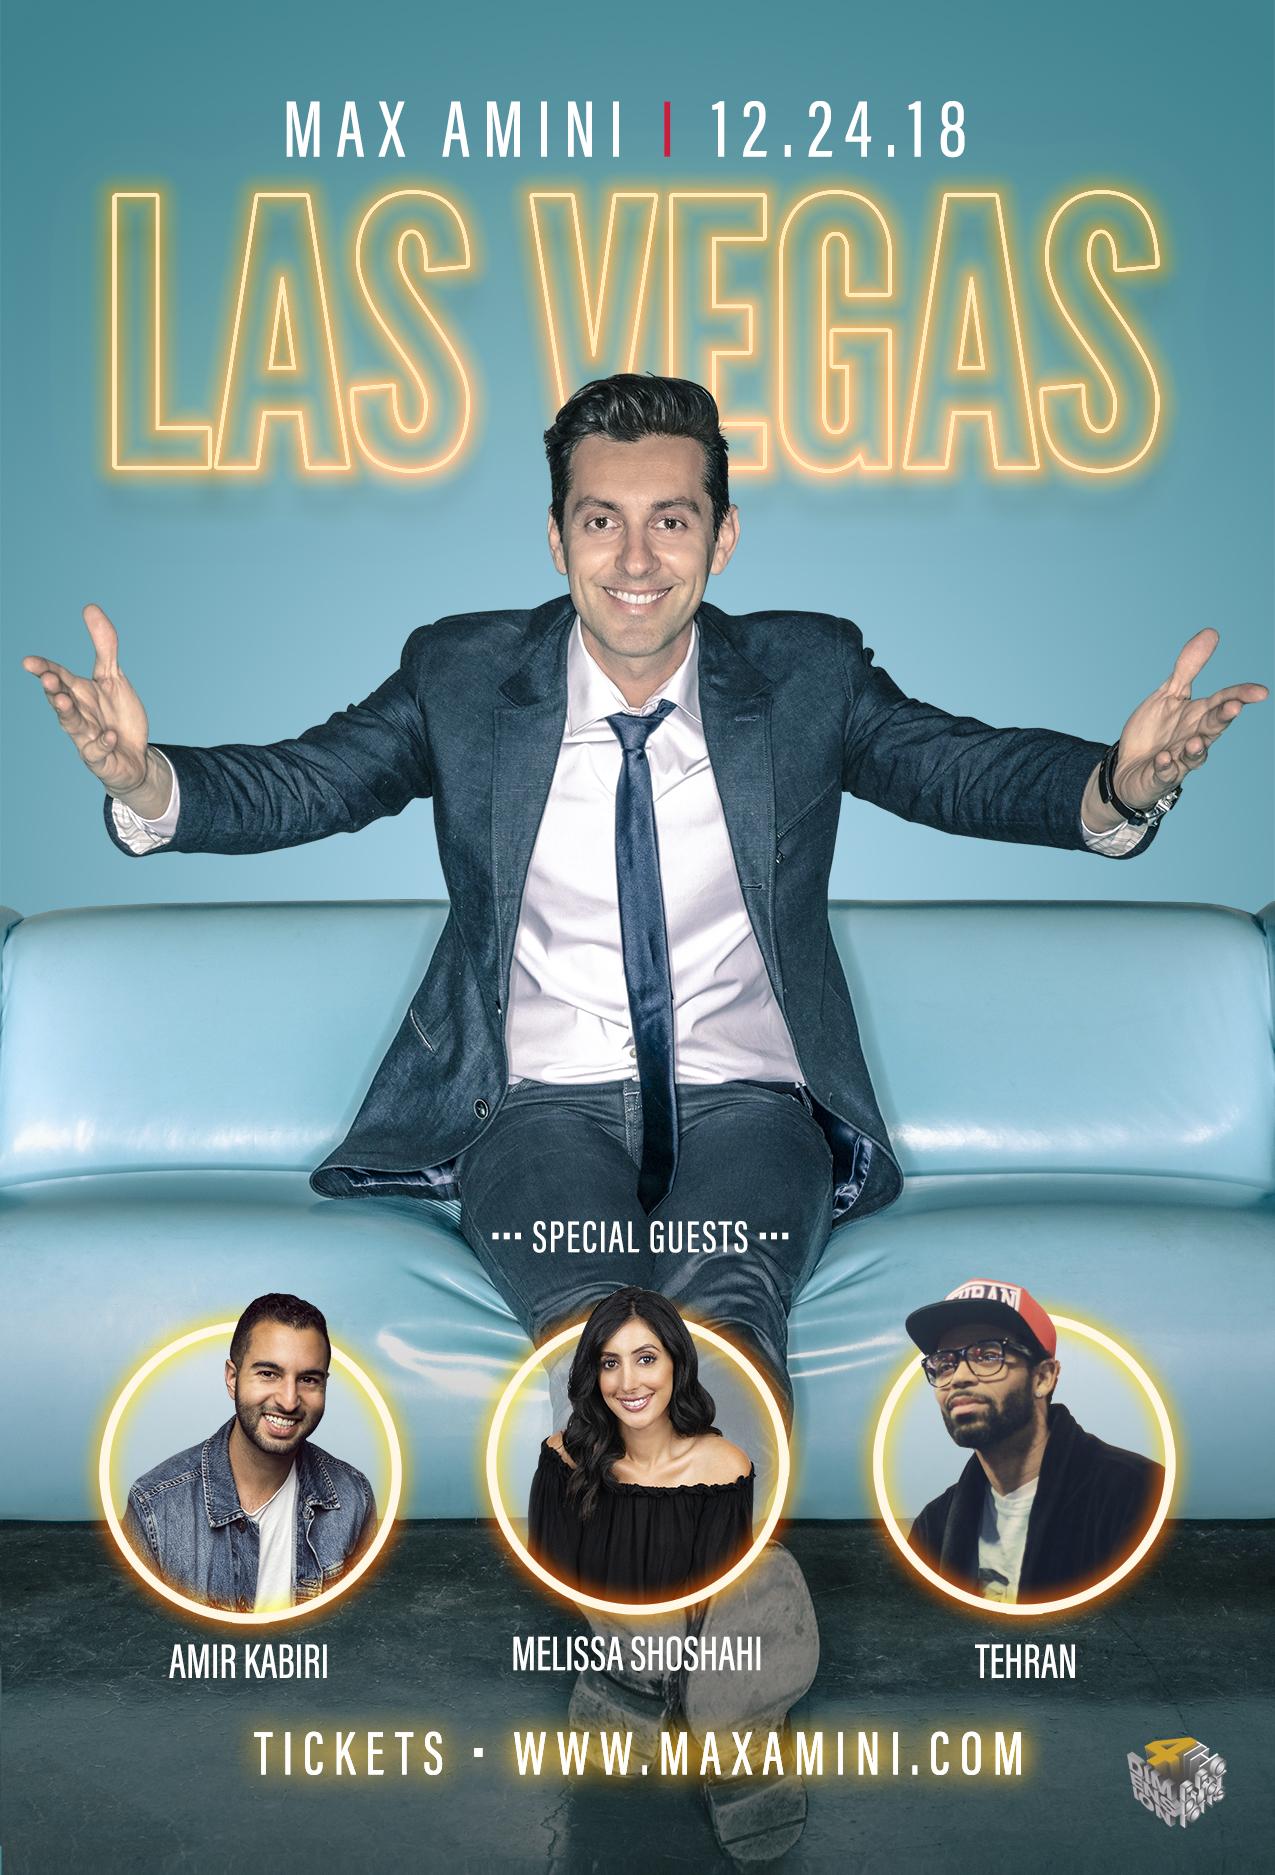 Las_Vegas_4x6_1(1).jpg